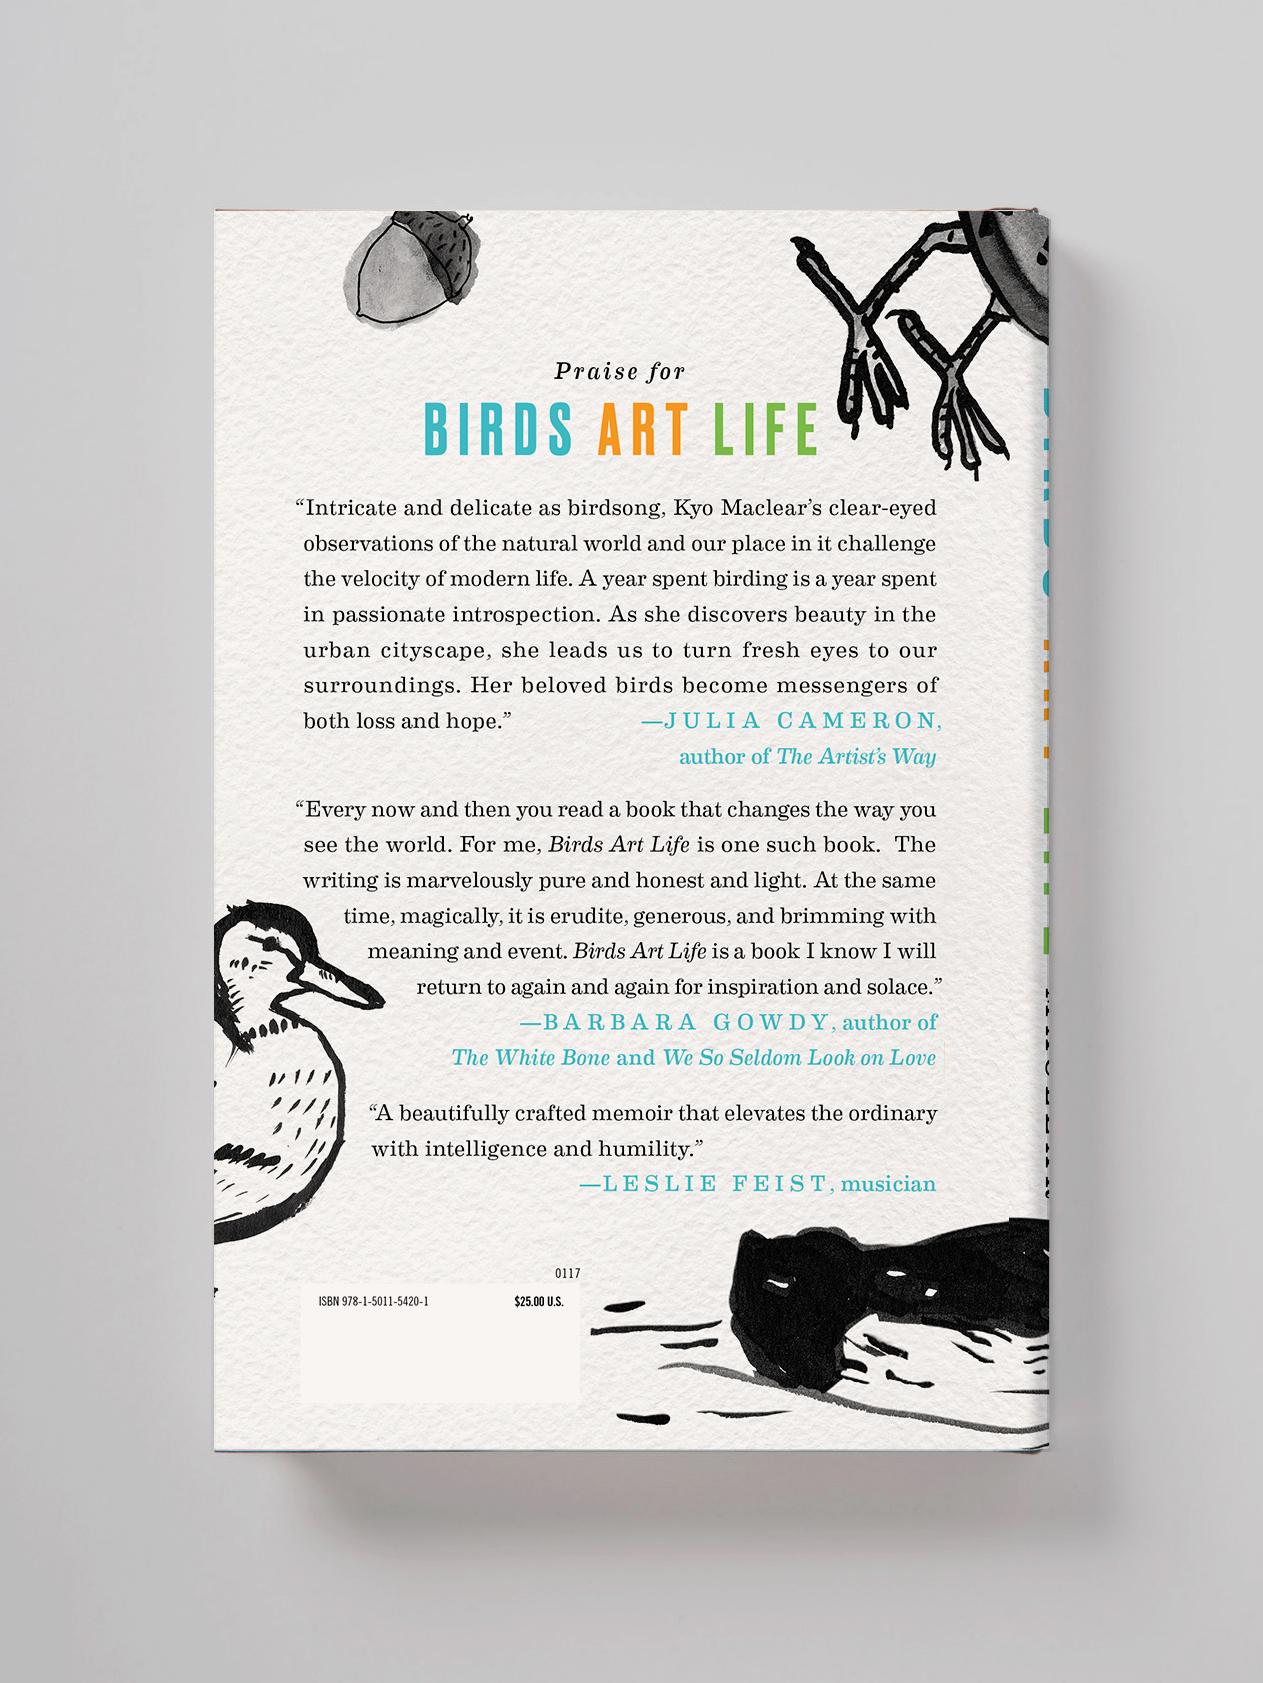 Birds Art Life verso—Kyo Maclear